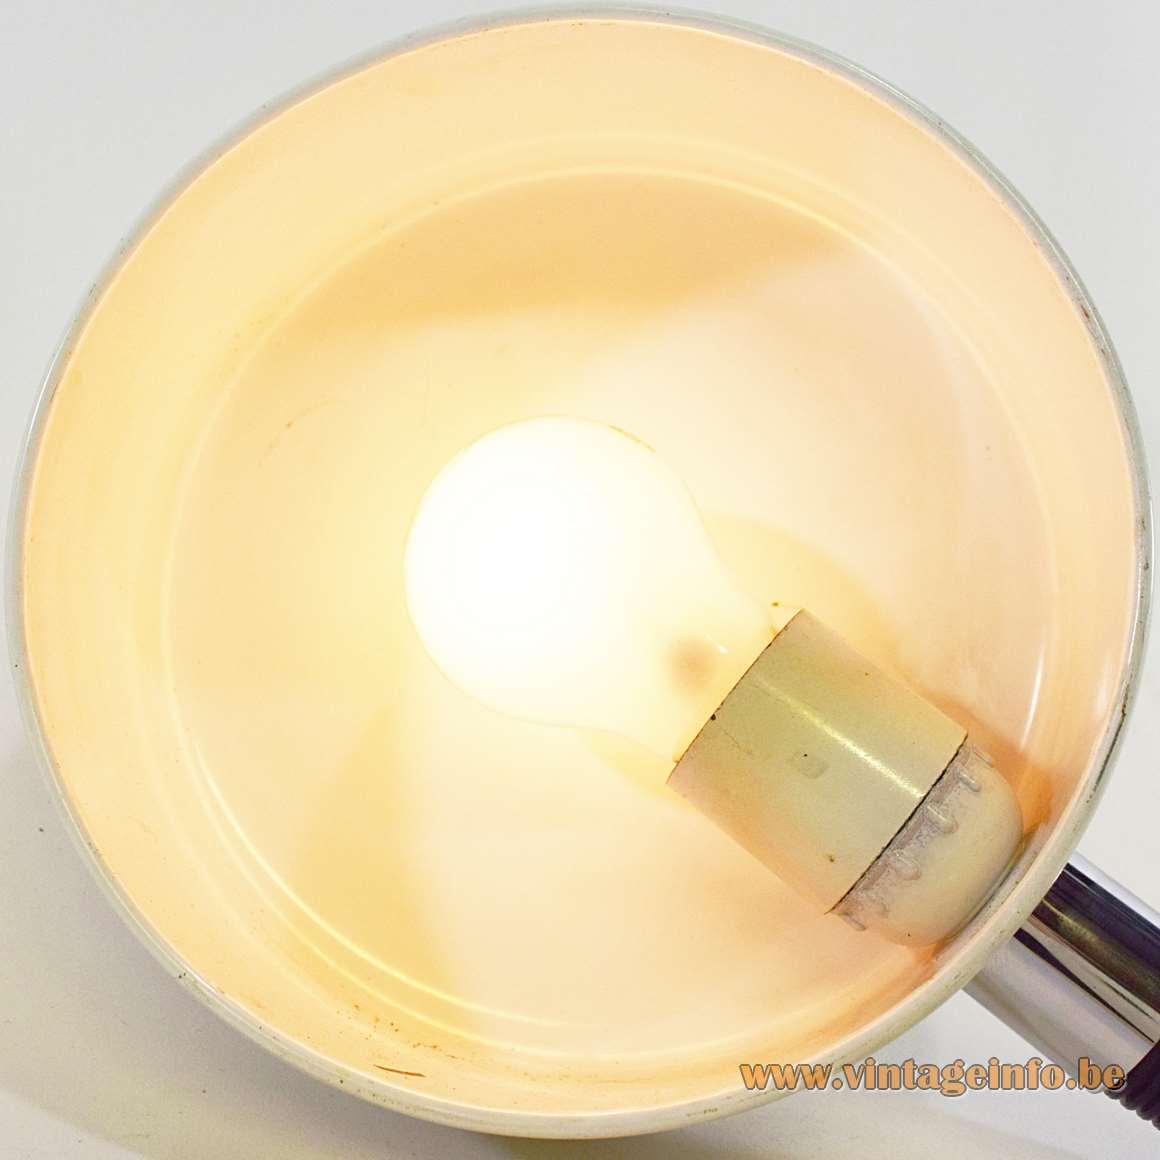 Hala Desk Light - inside of the lampshade